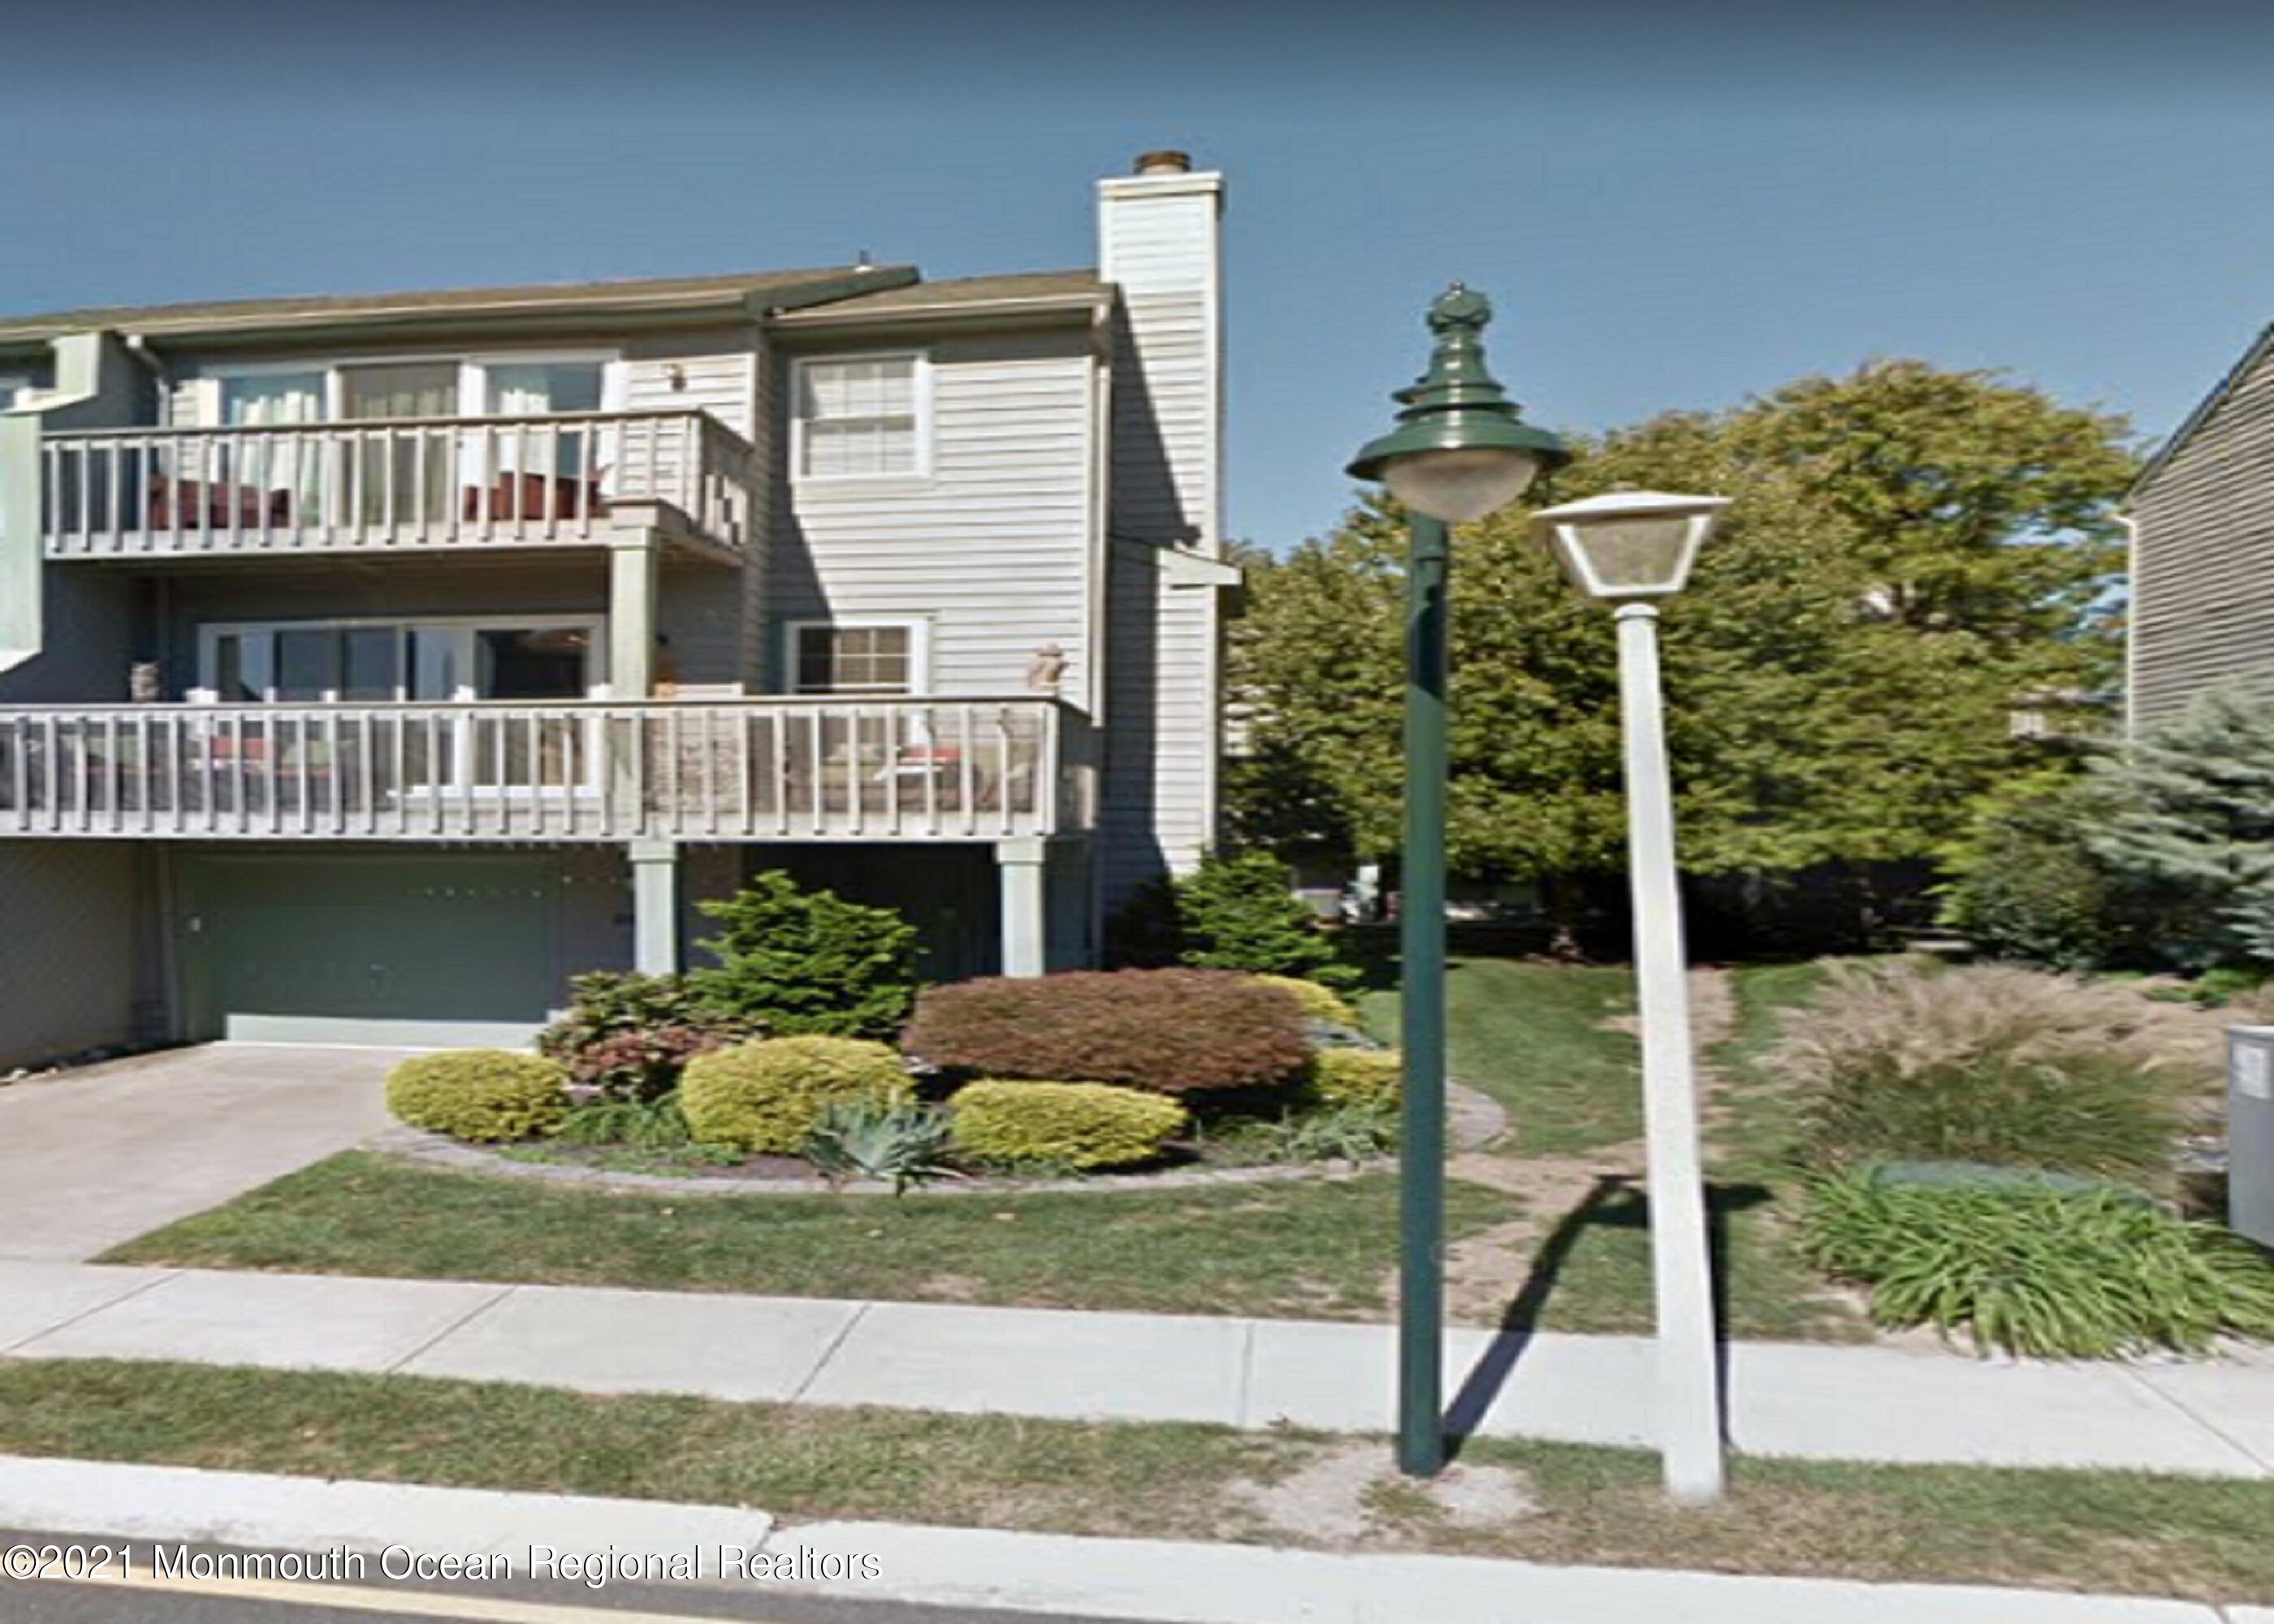 315 Spinnaker Way, Neptune Township, NJ 07753